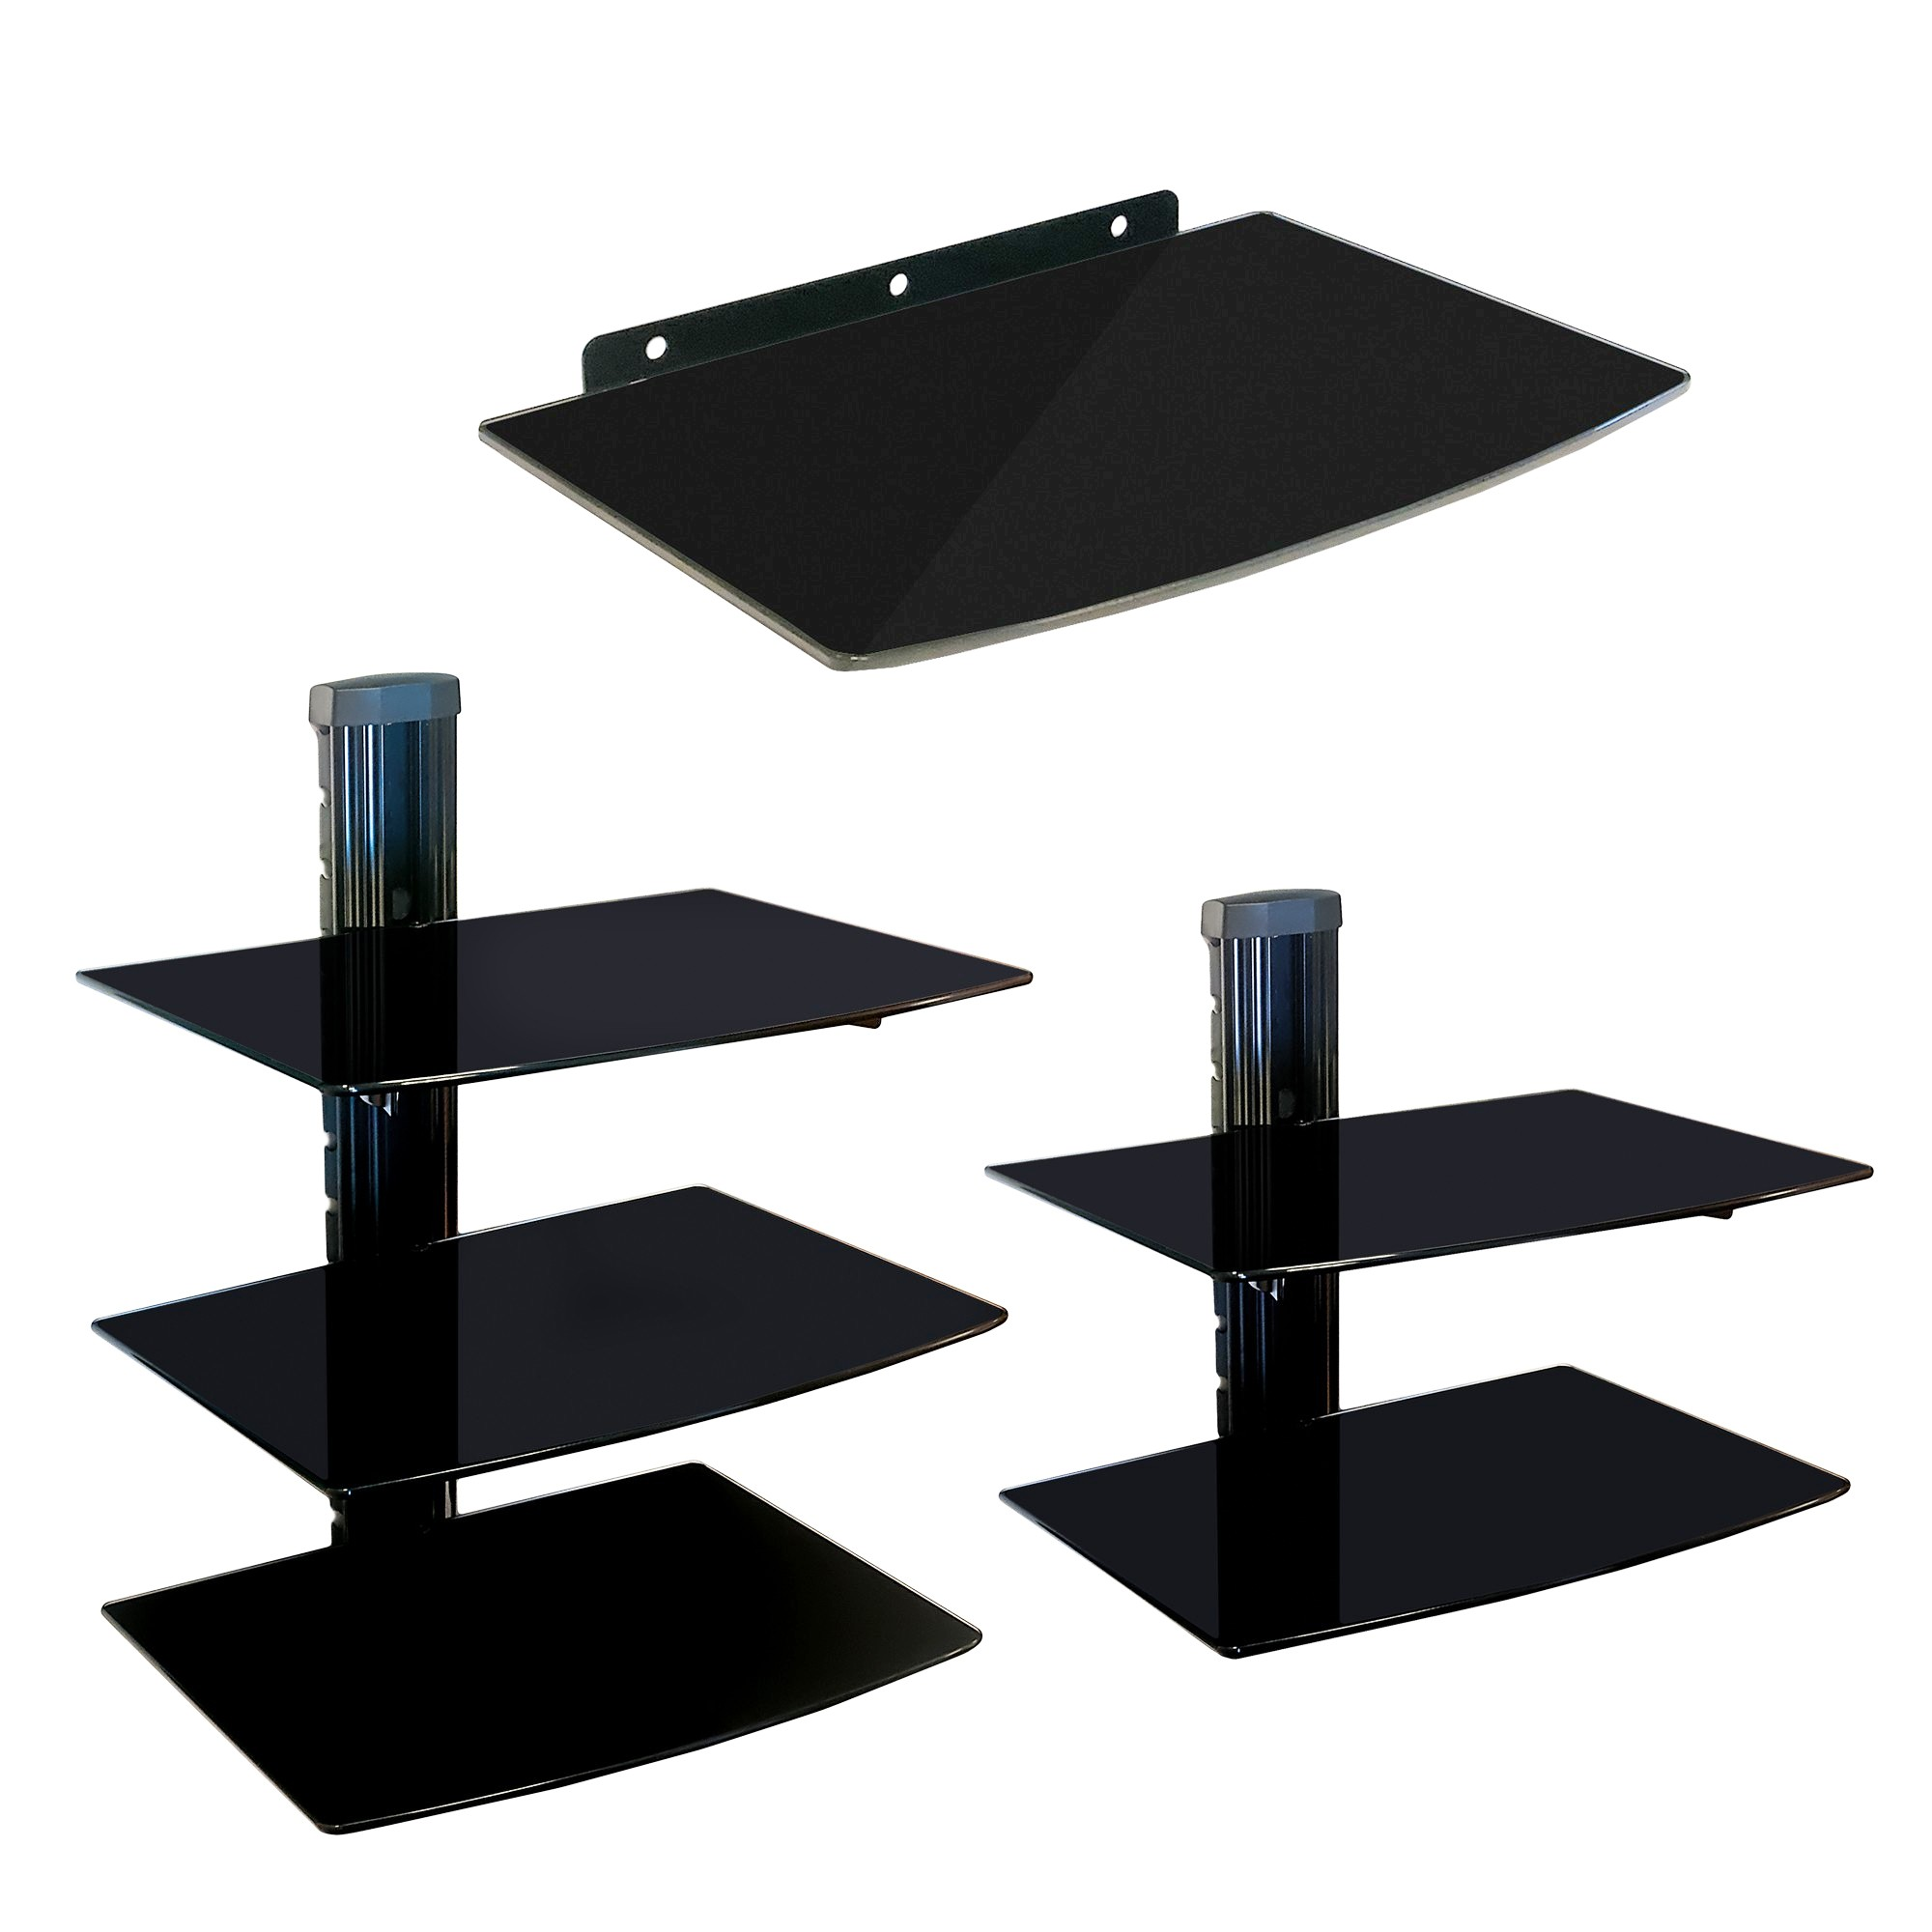 nemaxx glas dvd tv wandregal wandhalterung hifi media regal receiver konsole ebay. Black Bedroom Furniture Sets. Home Design Ideas